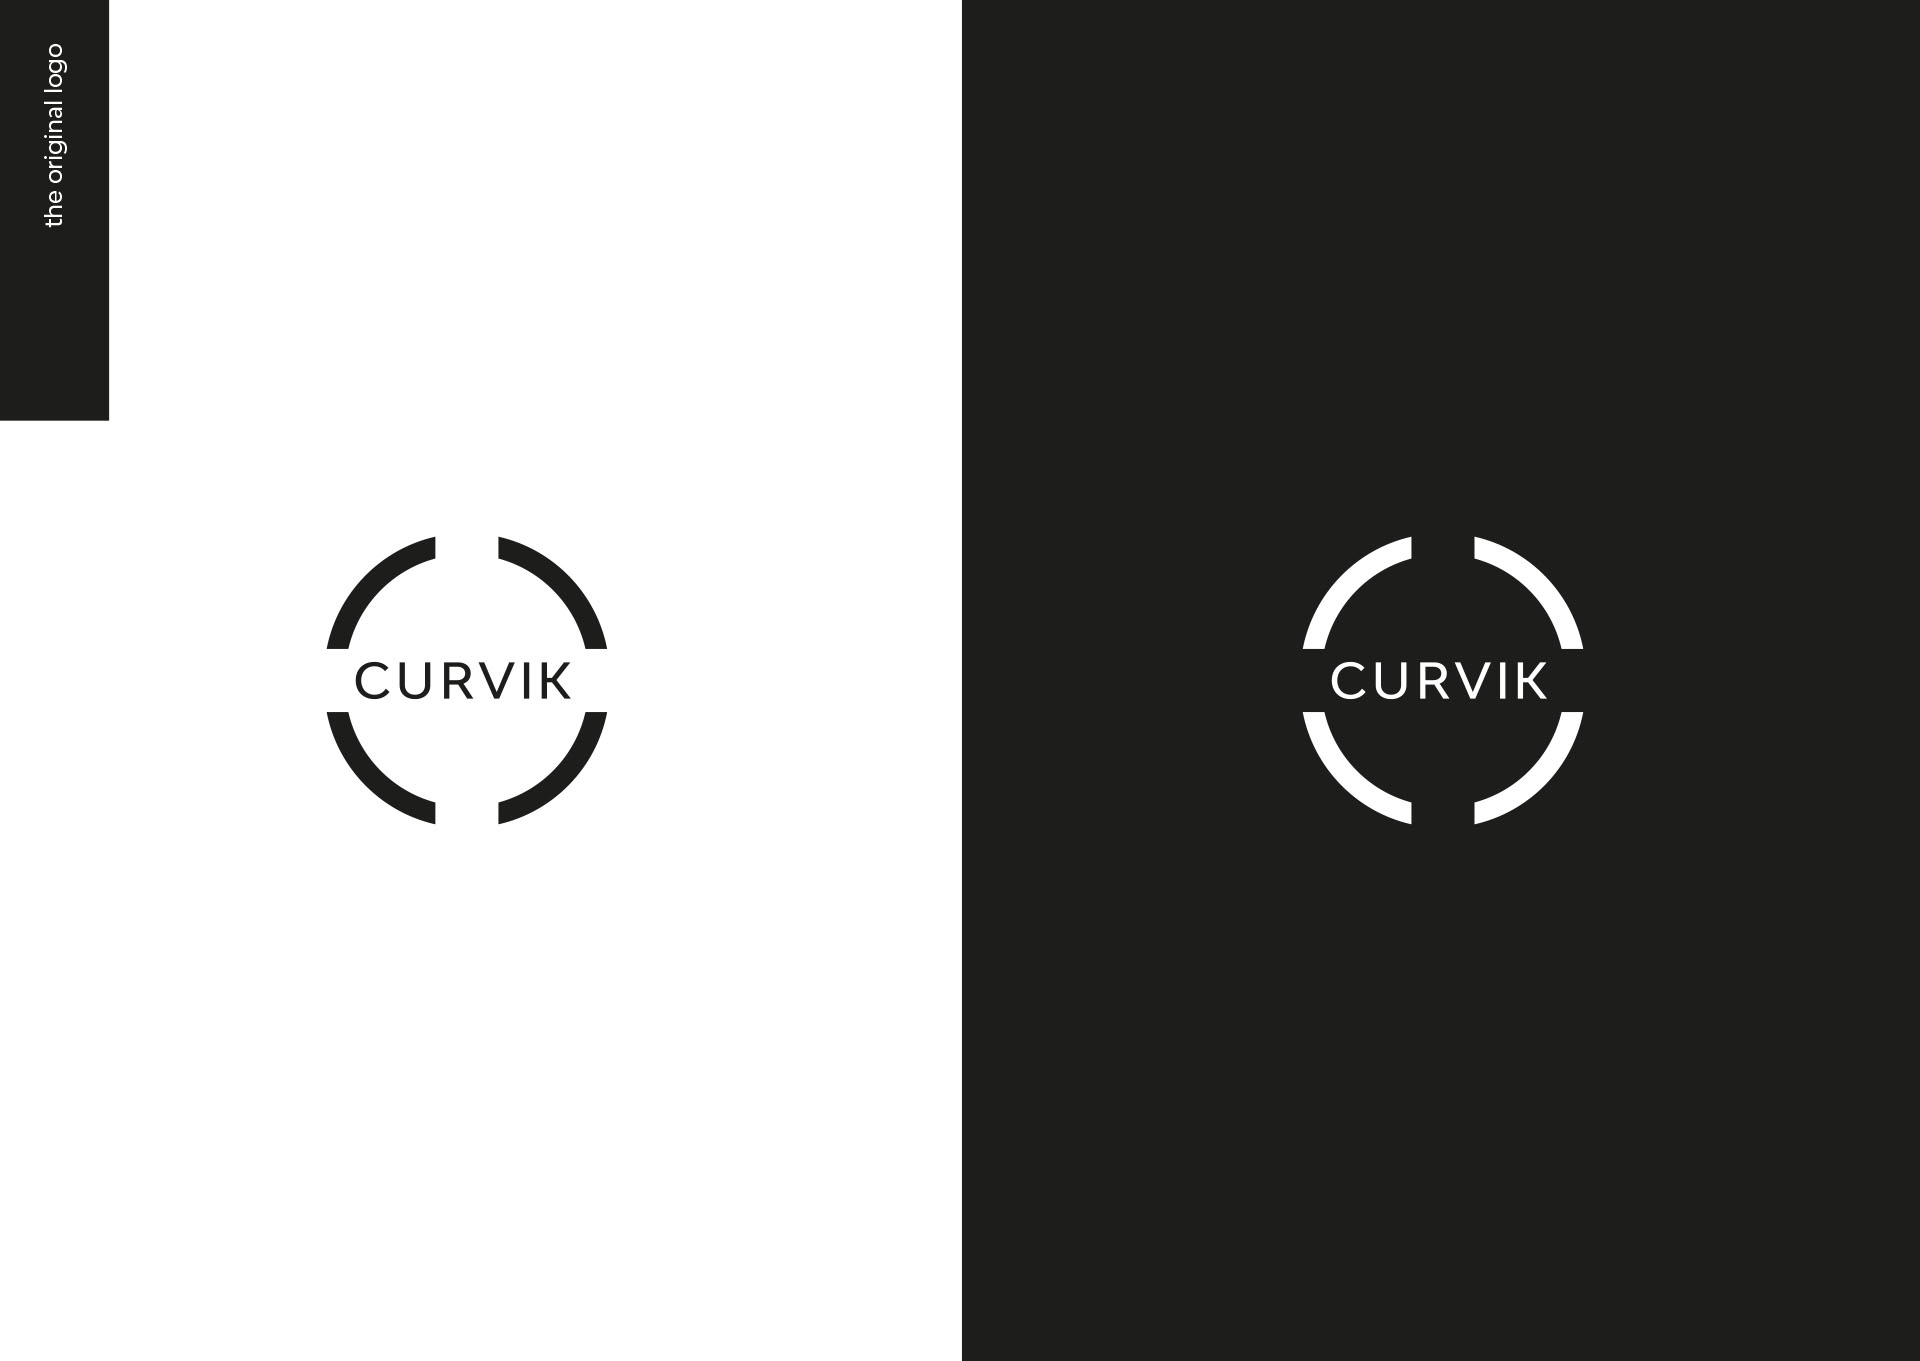 CURVIK logo study5.jpg